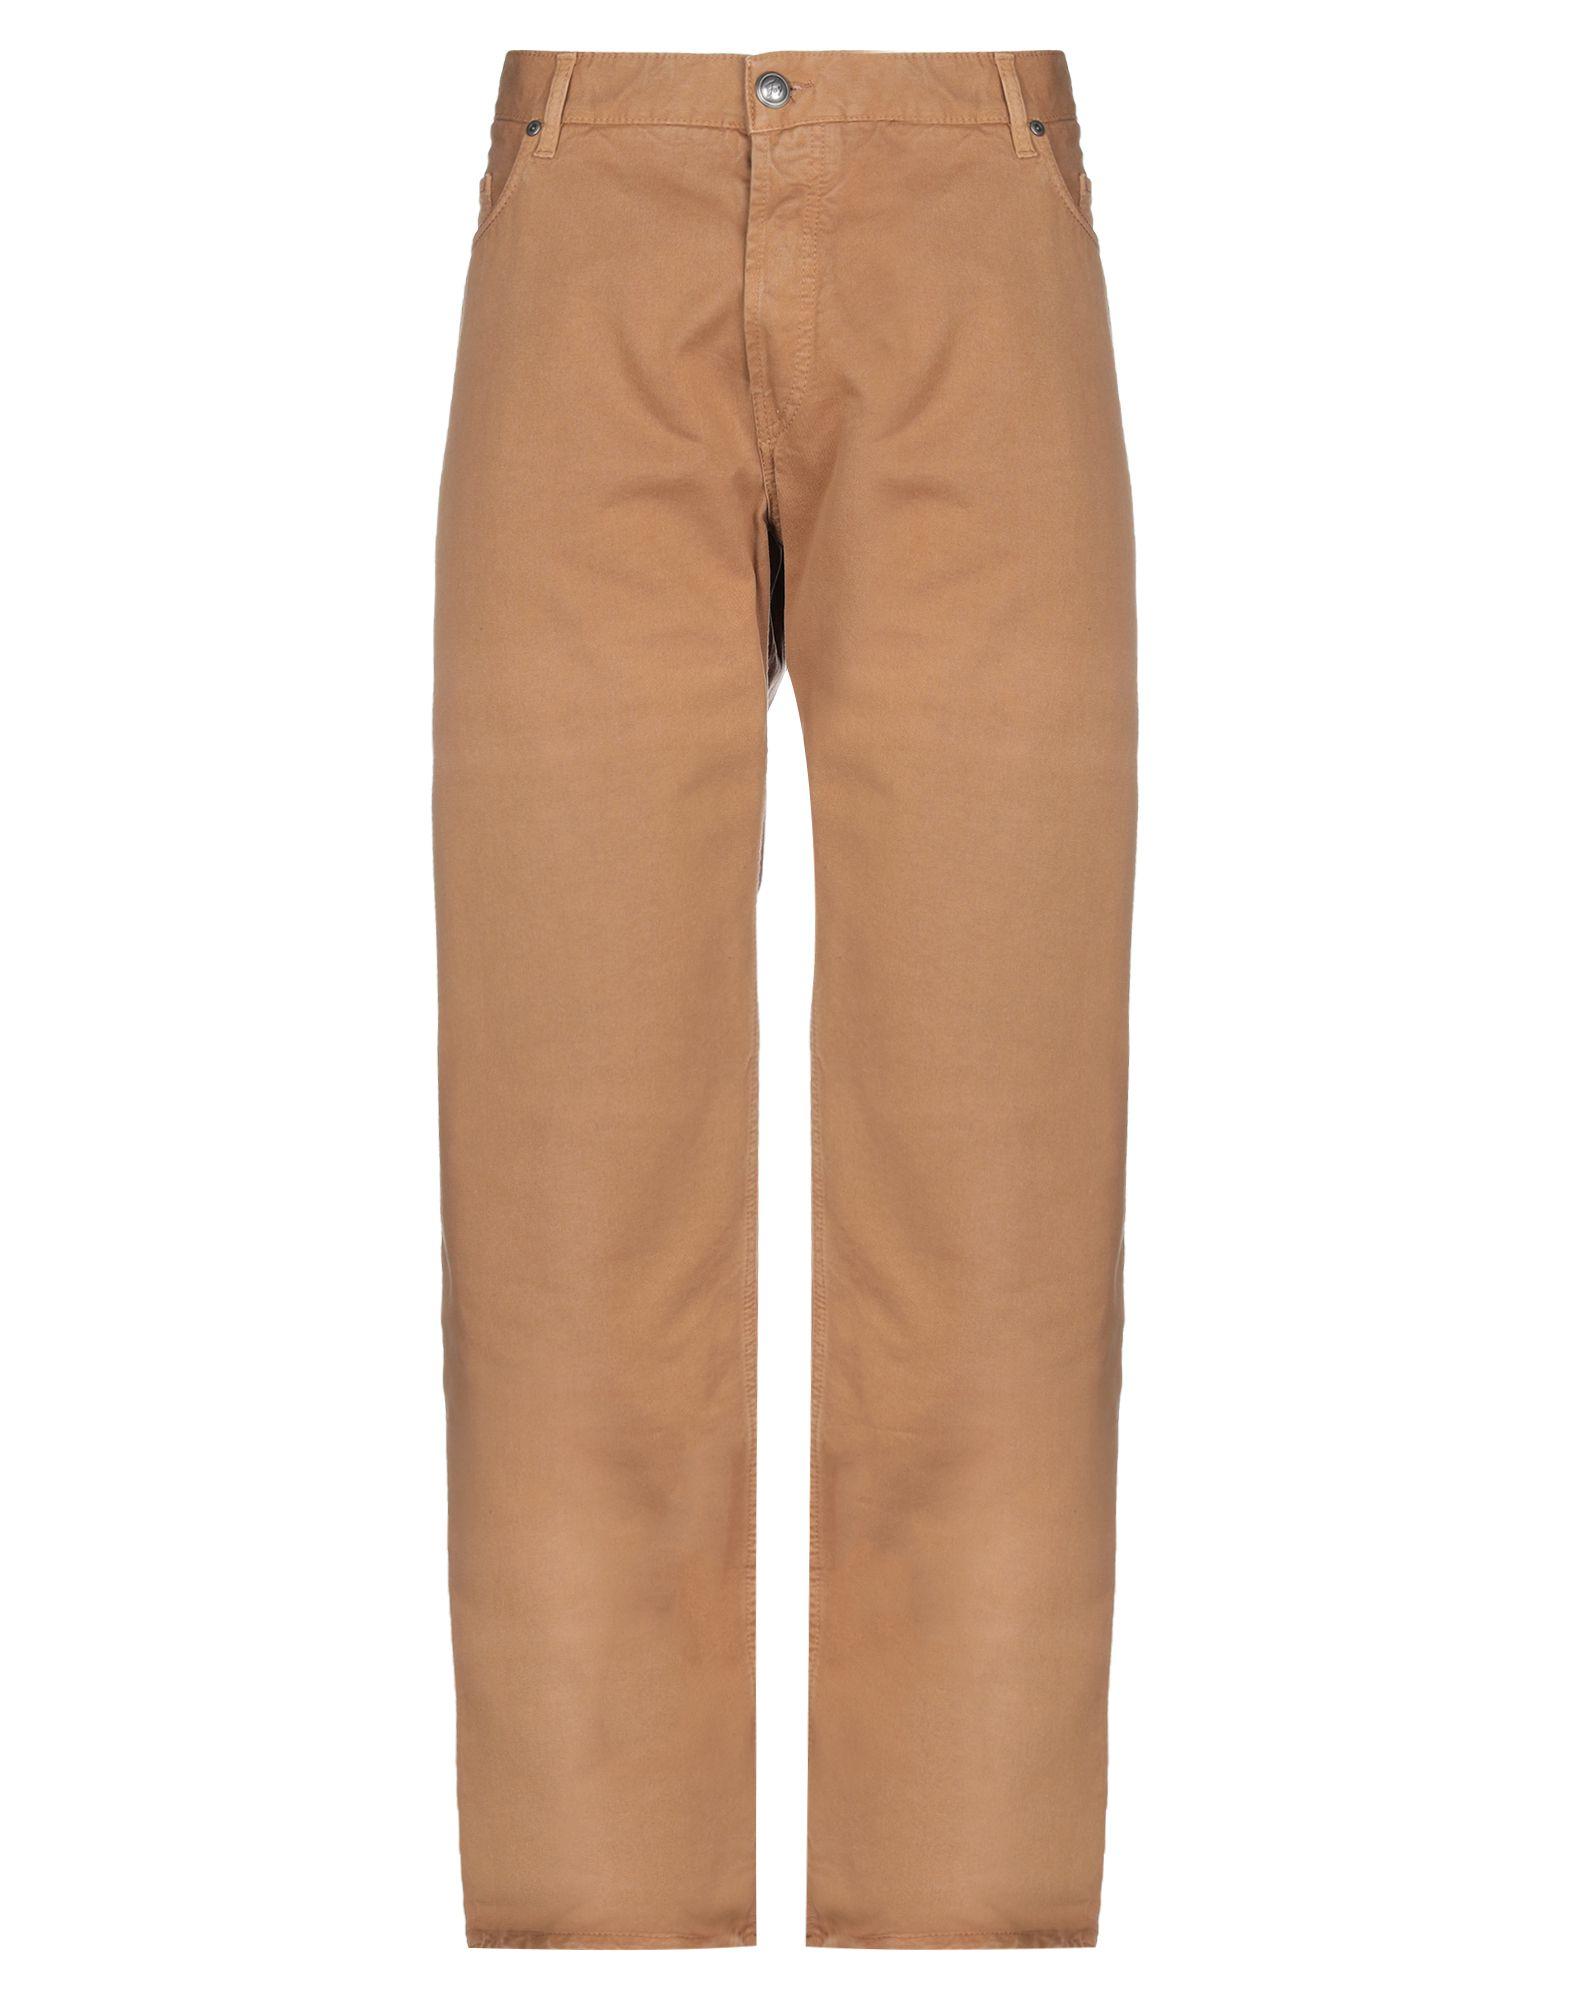 Pantaloni Jeans Jeans Fay uomo - 13367201AP  niedriger Preis von 40%